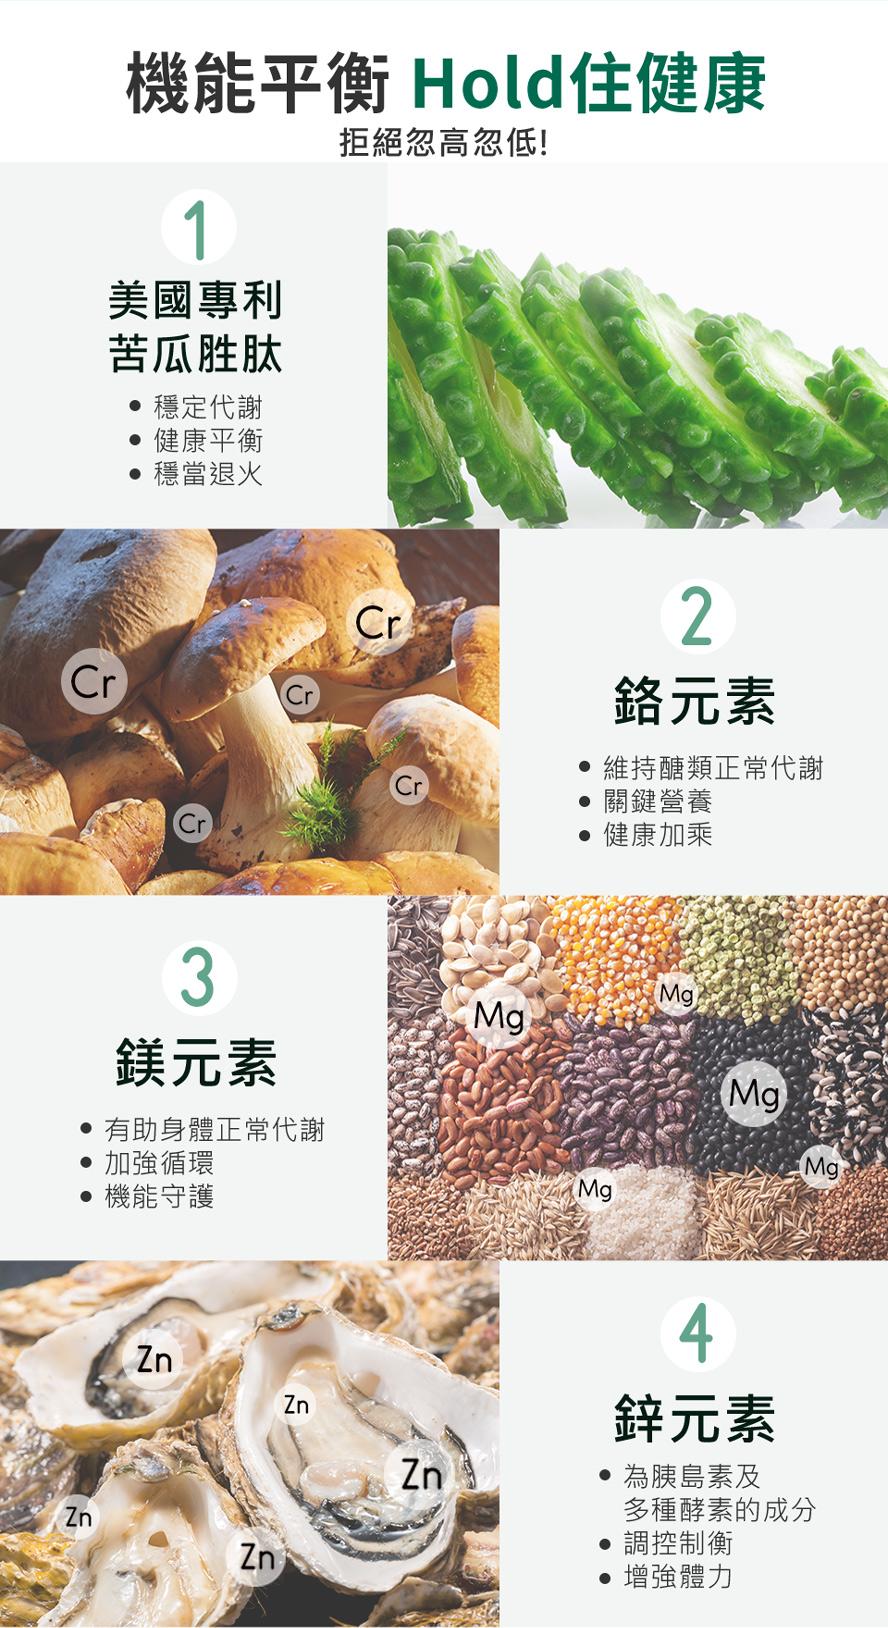 BHK's專利苦瓜胜肽清爽降火守護健康